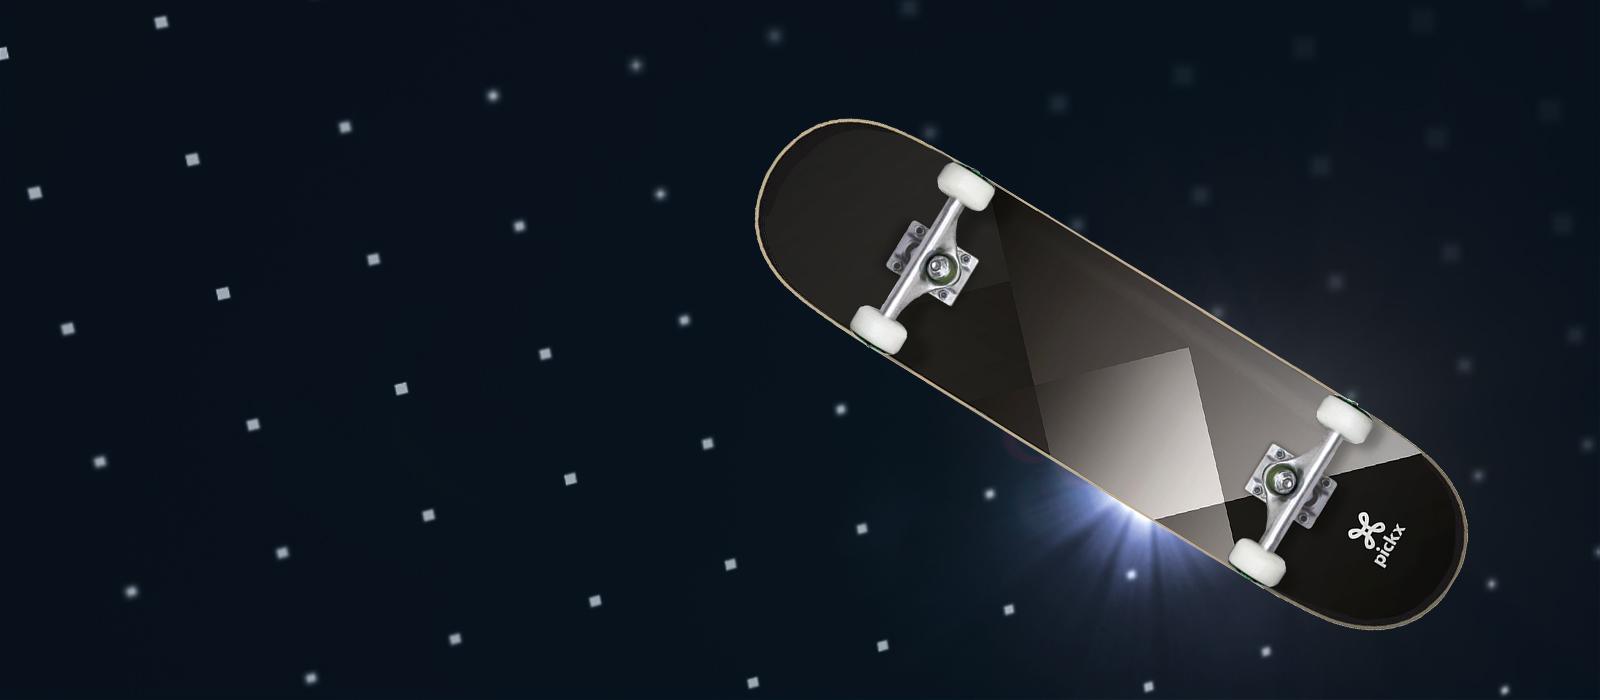 Win een Pickx skateboard